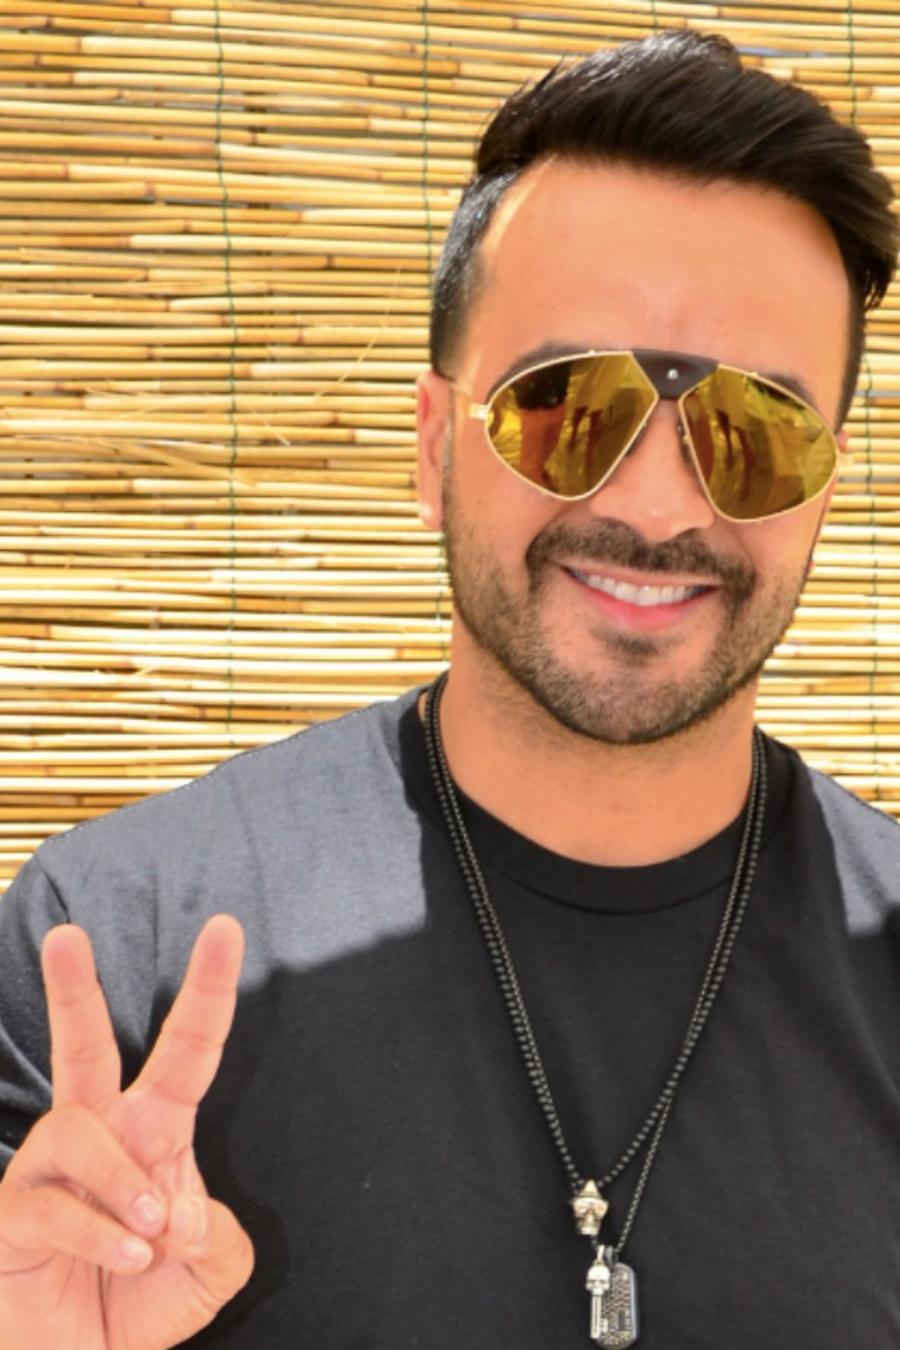 Luis Fonsi wearing sunglasses